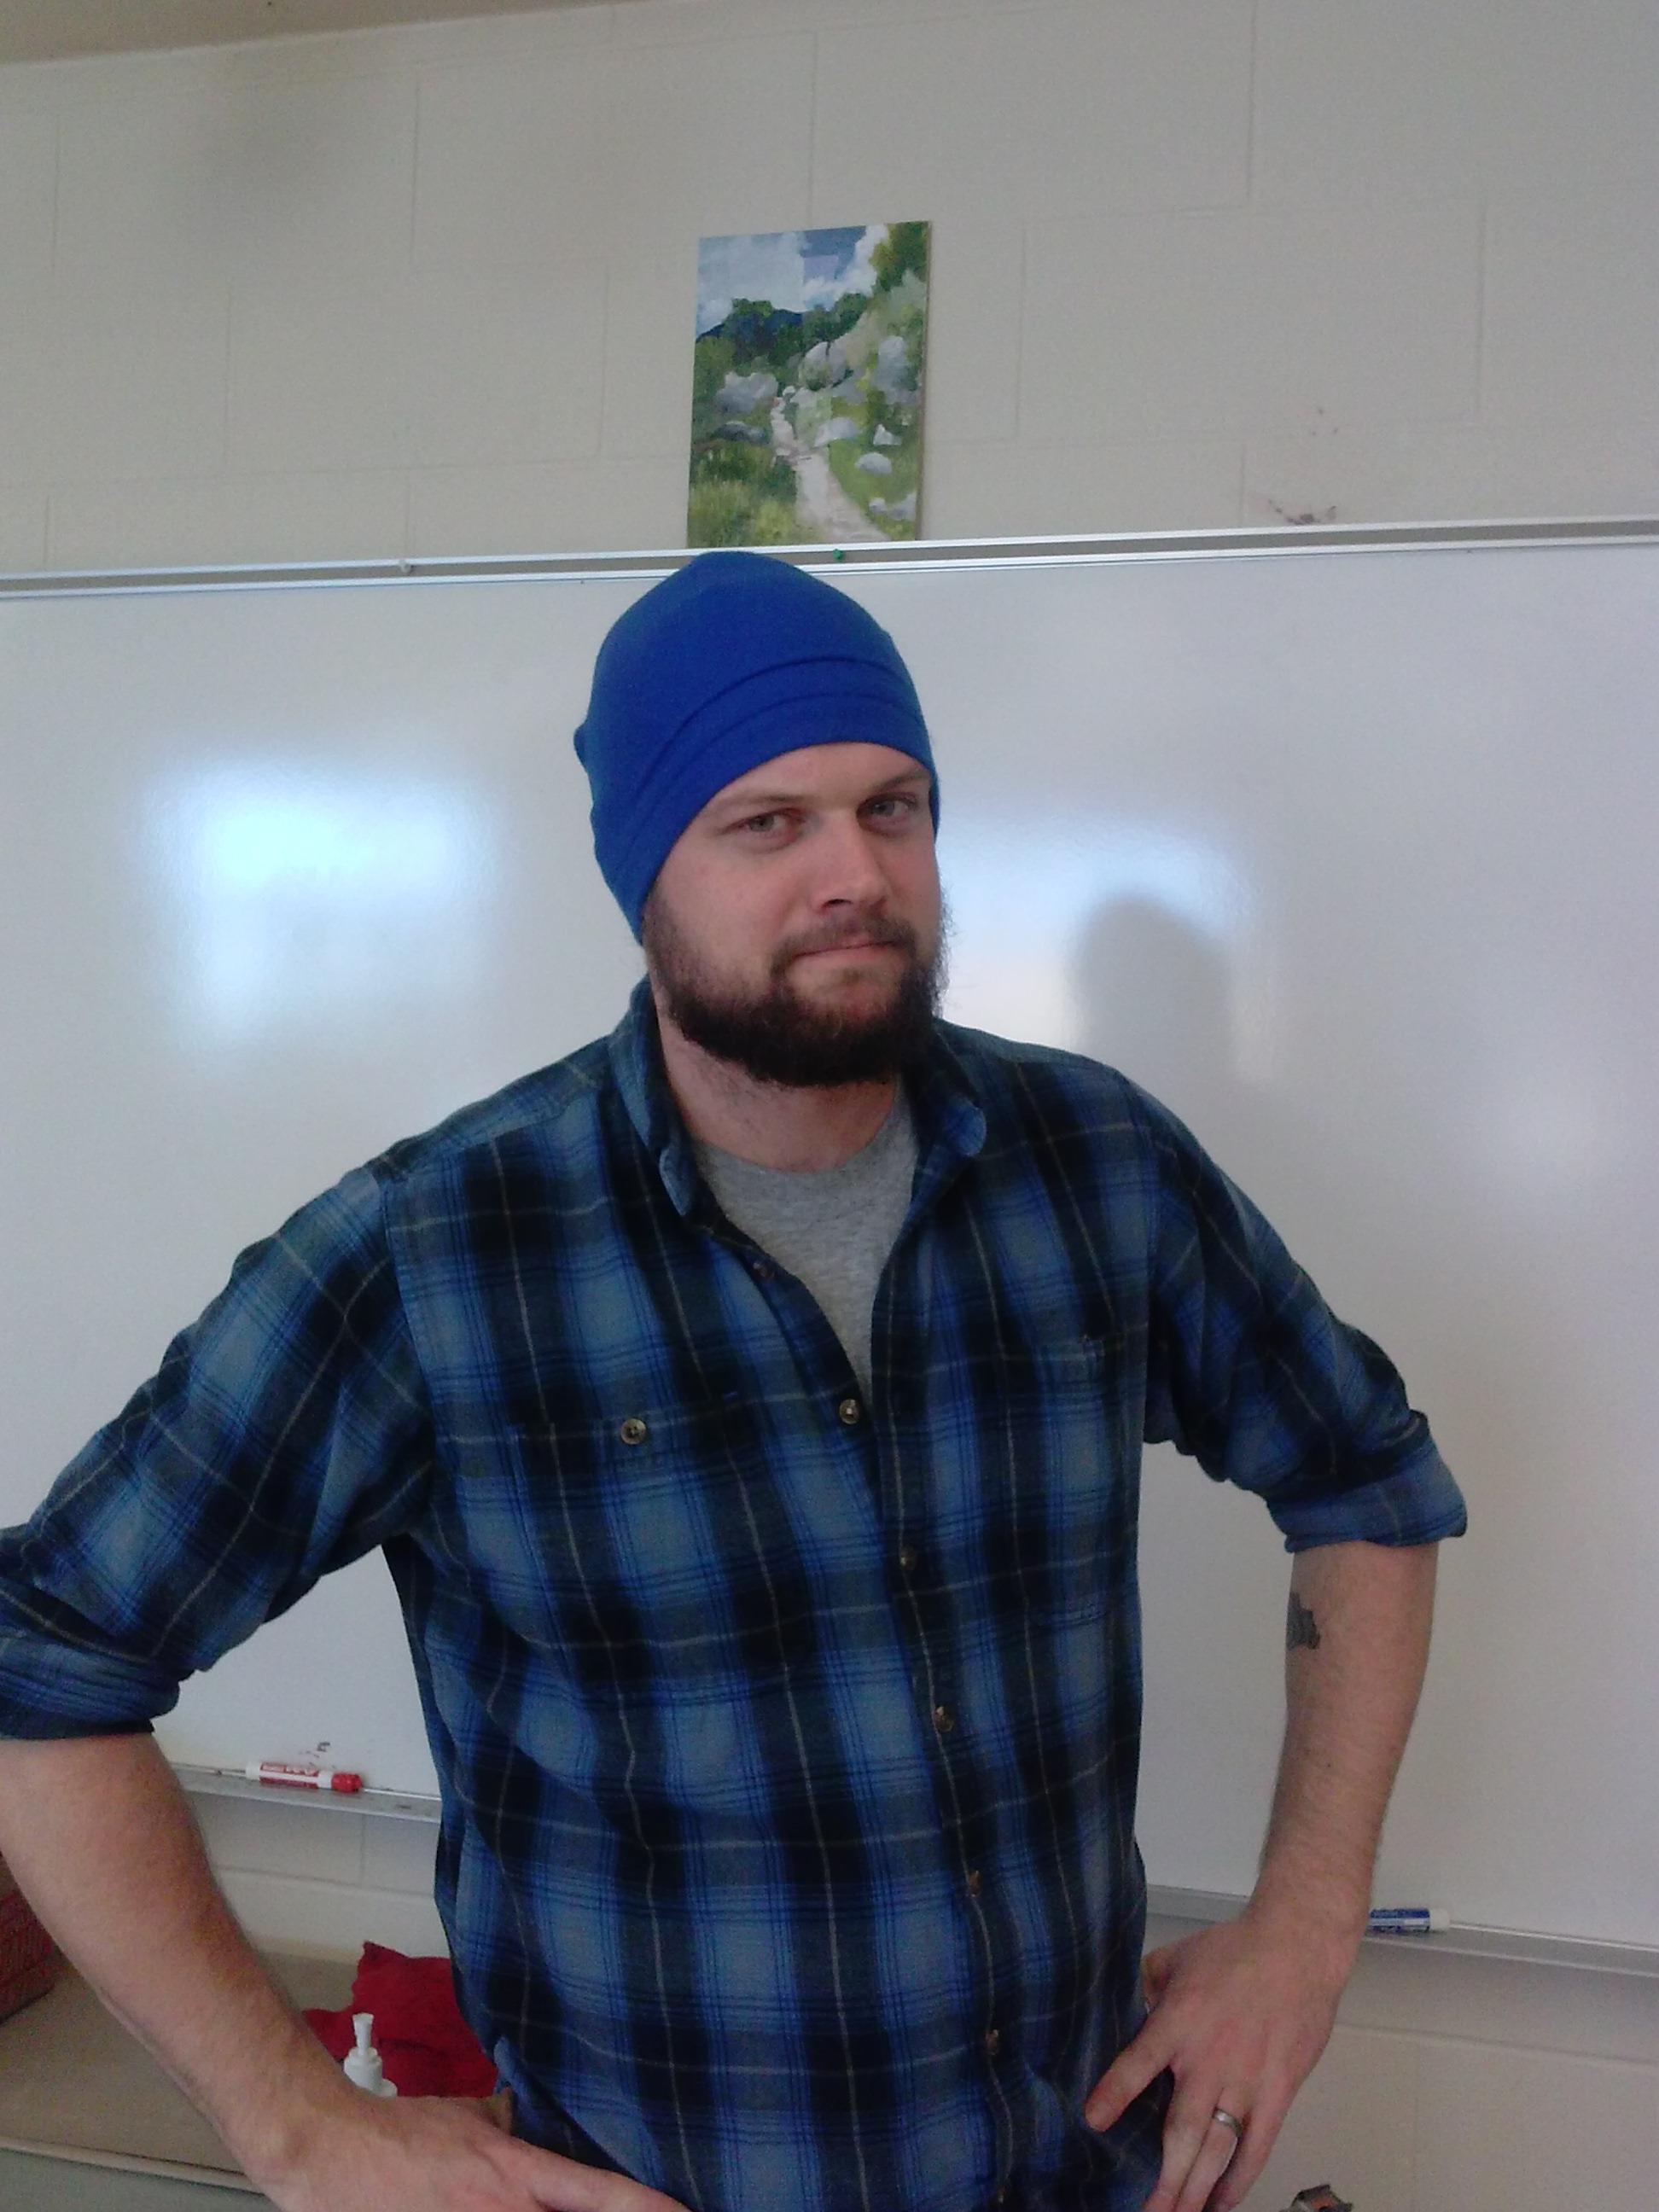 MAKING HATS 101